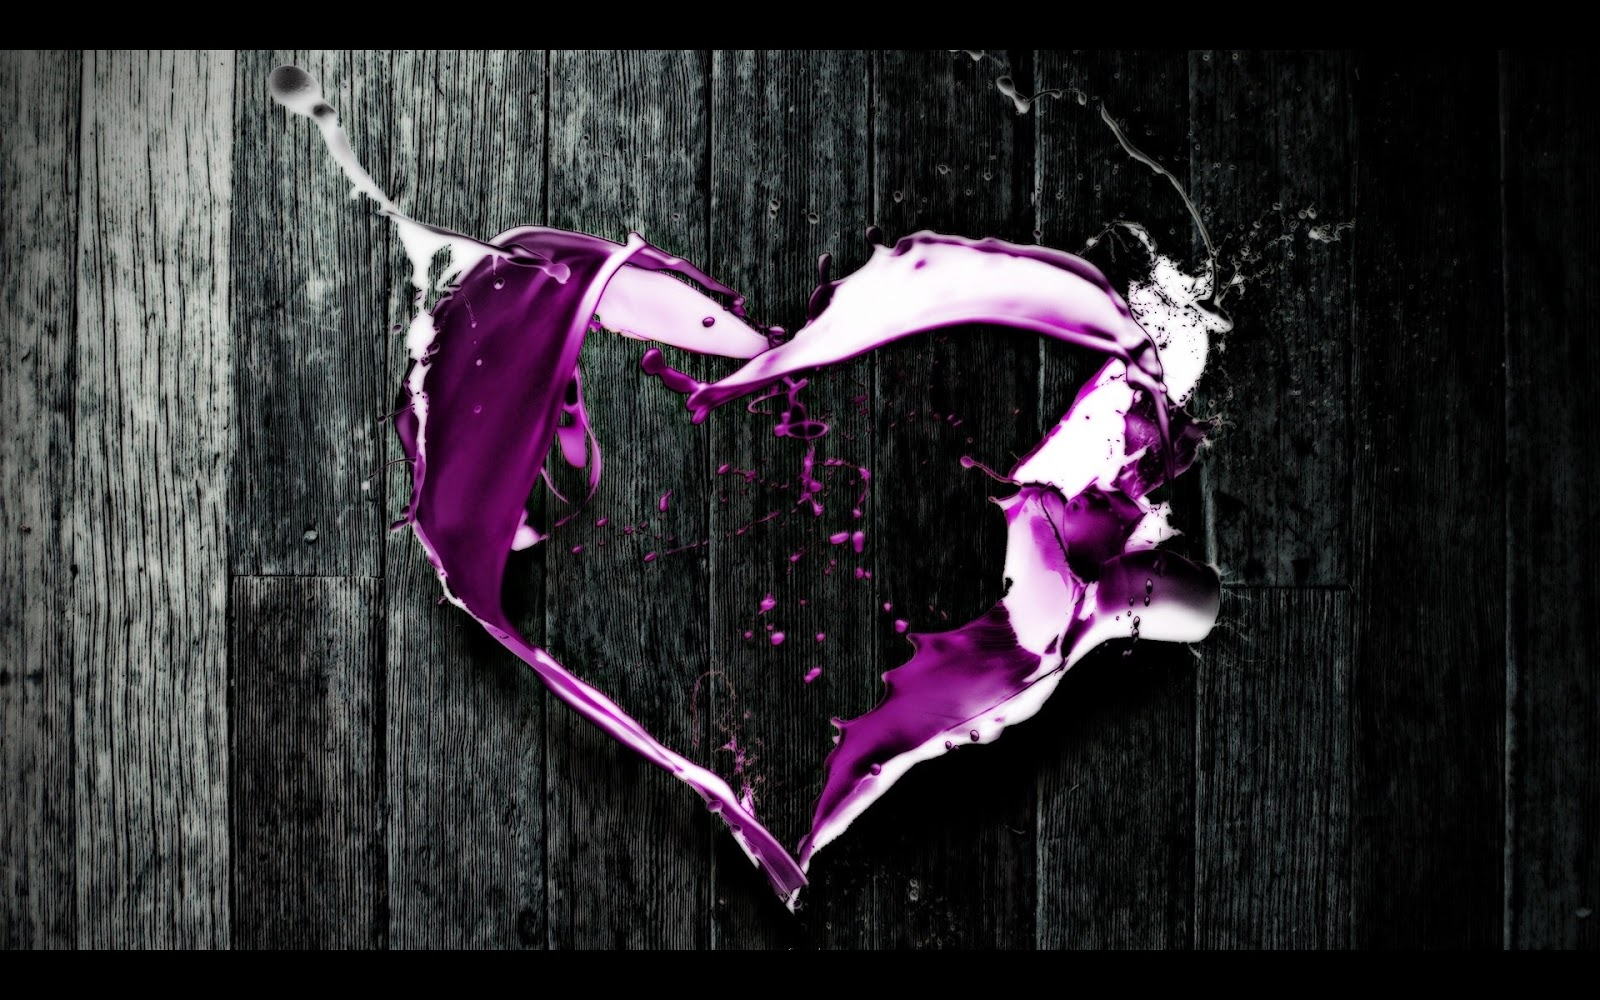 Purple And Black Hearts Wallpaper: Purple Heart Abstract Art HD Wallpaper